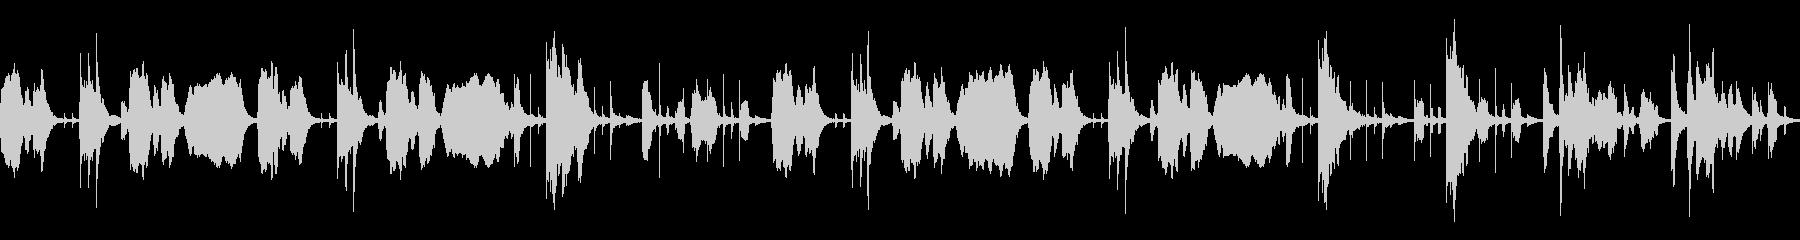 YouTube おとぼけトーク[ループ]の未再生の波形